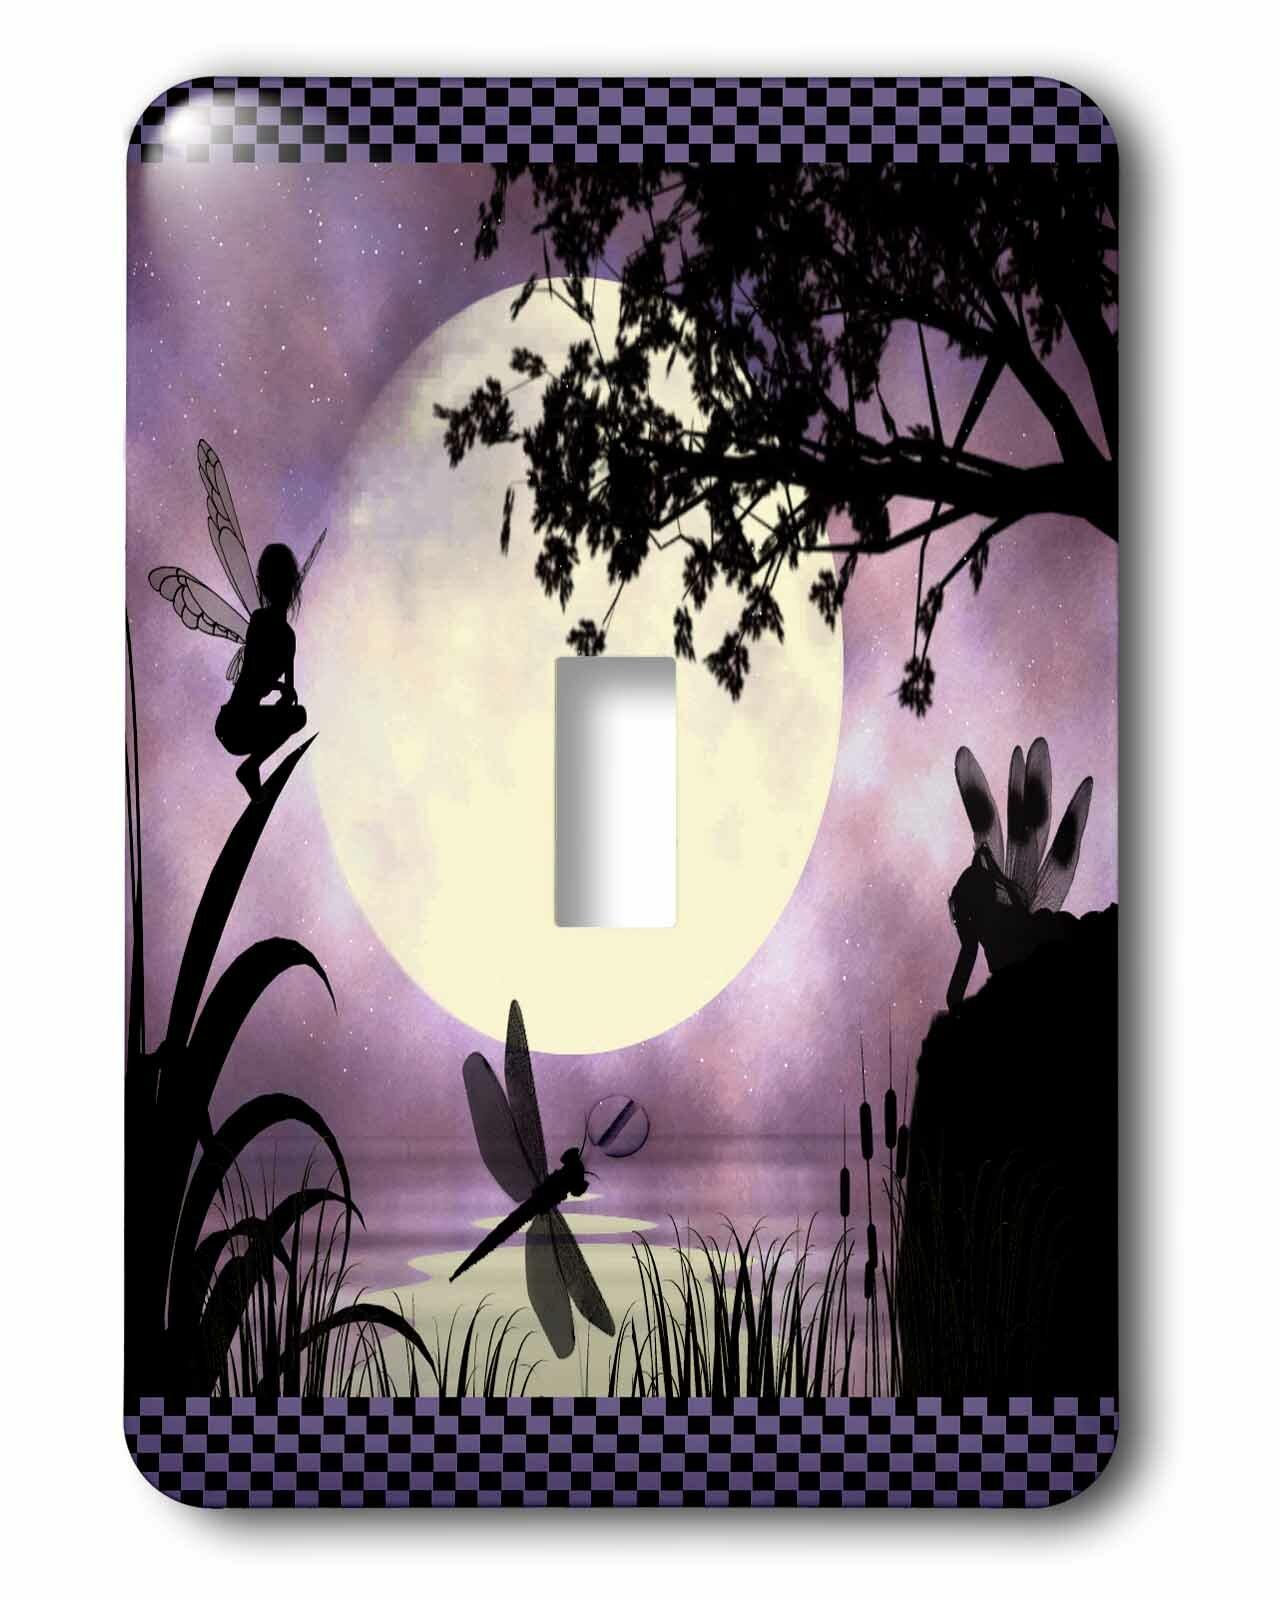 3drose Fairy Toggle Light Switch